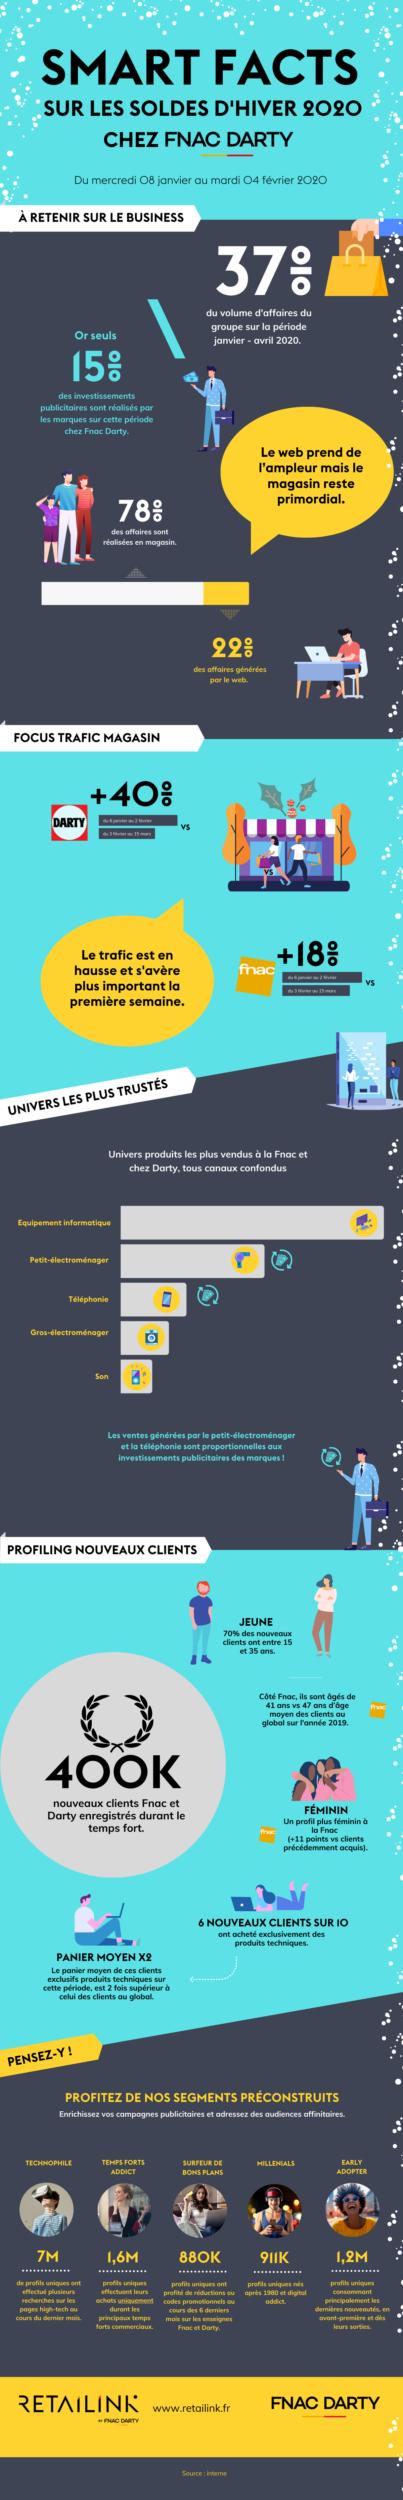 Retailink Fnac Darty infographie soldes d'hiver